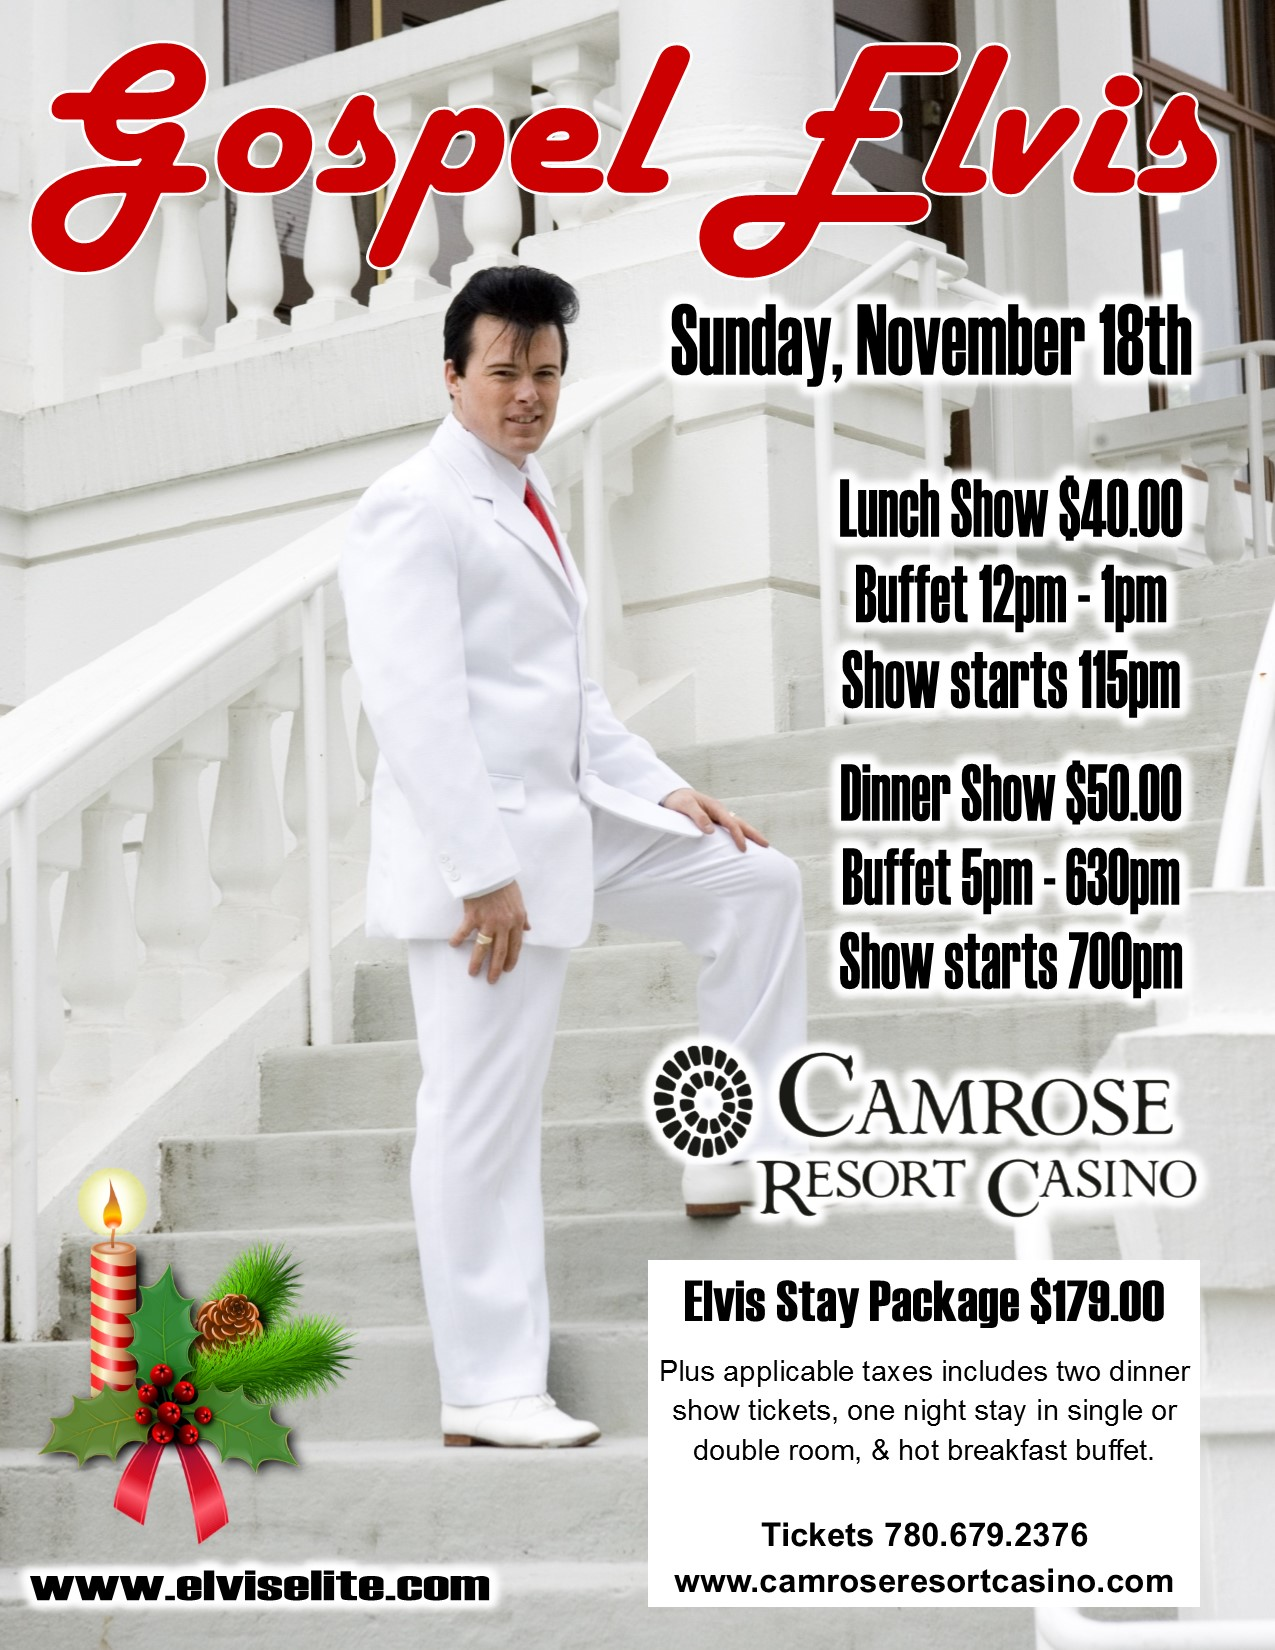 Camrose Casino Events